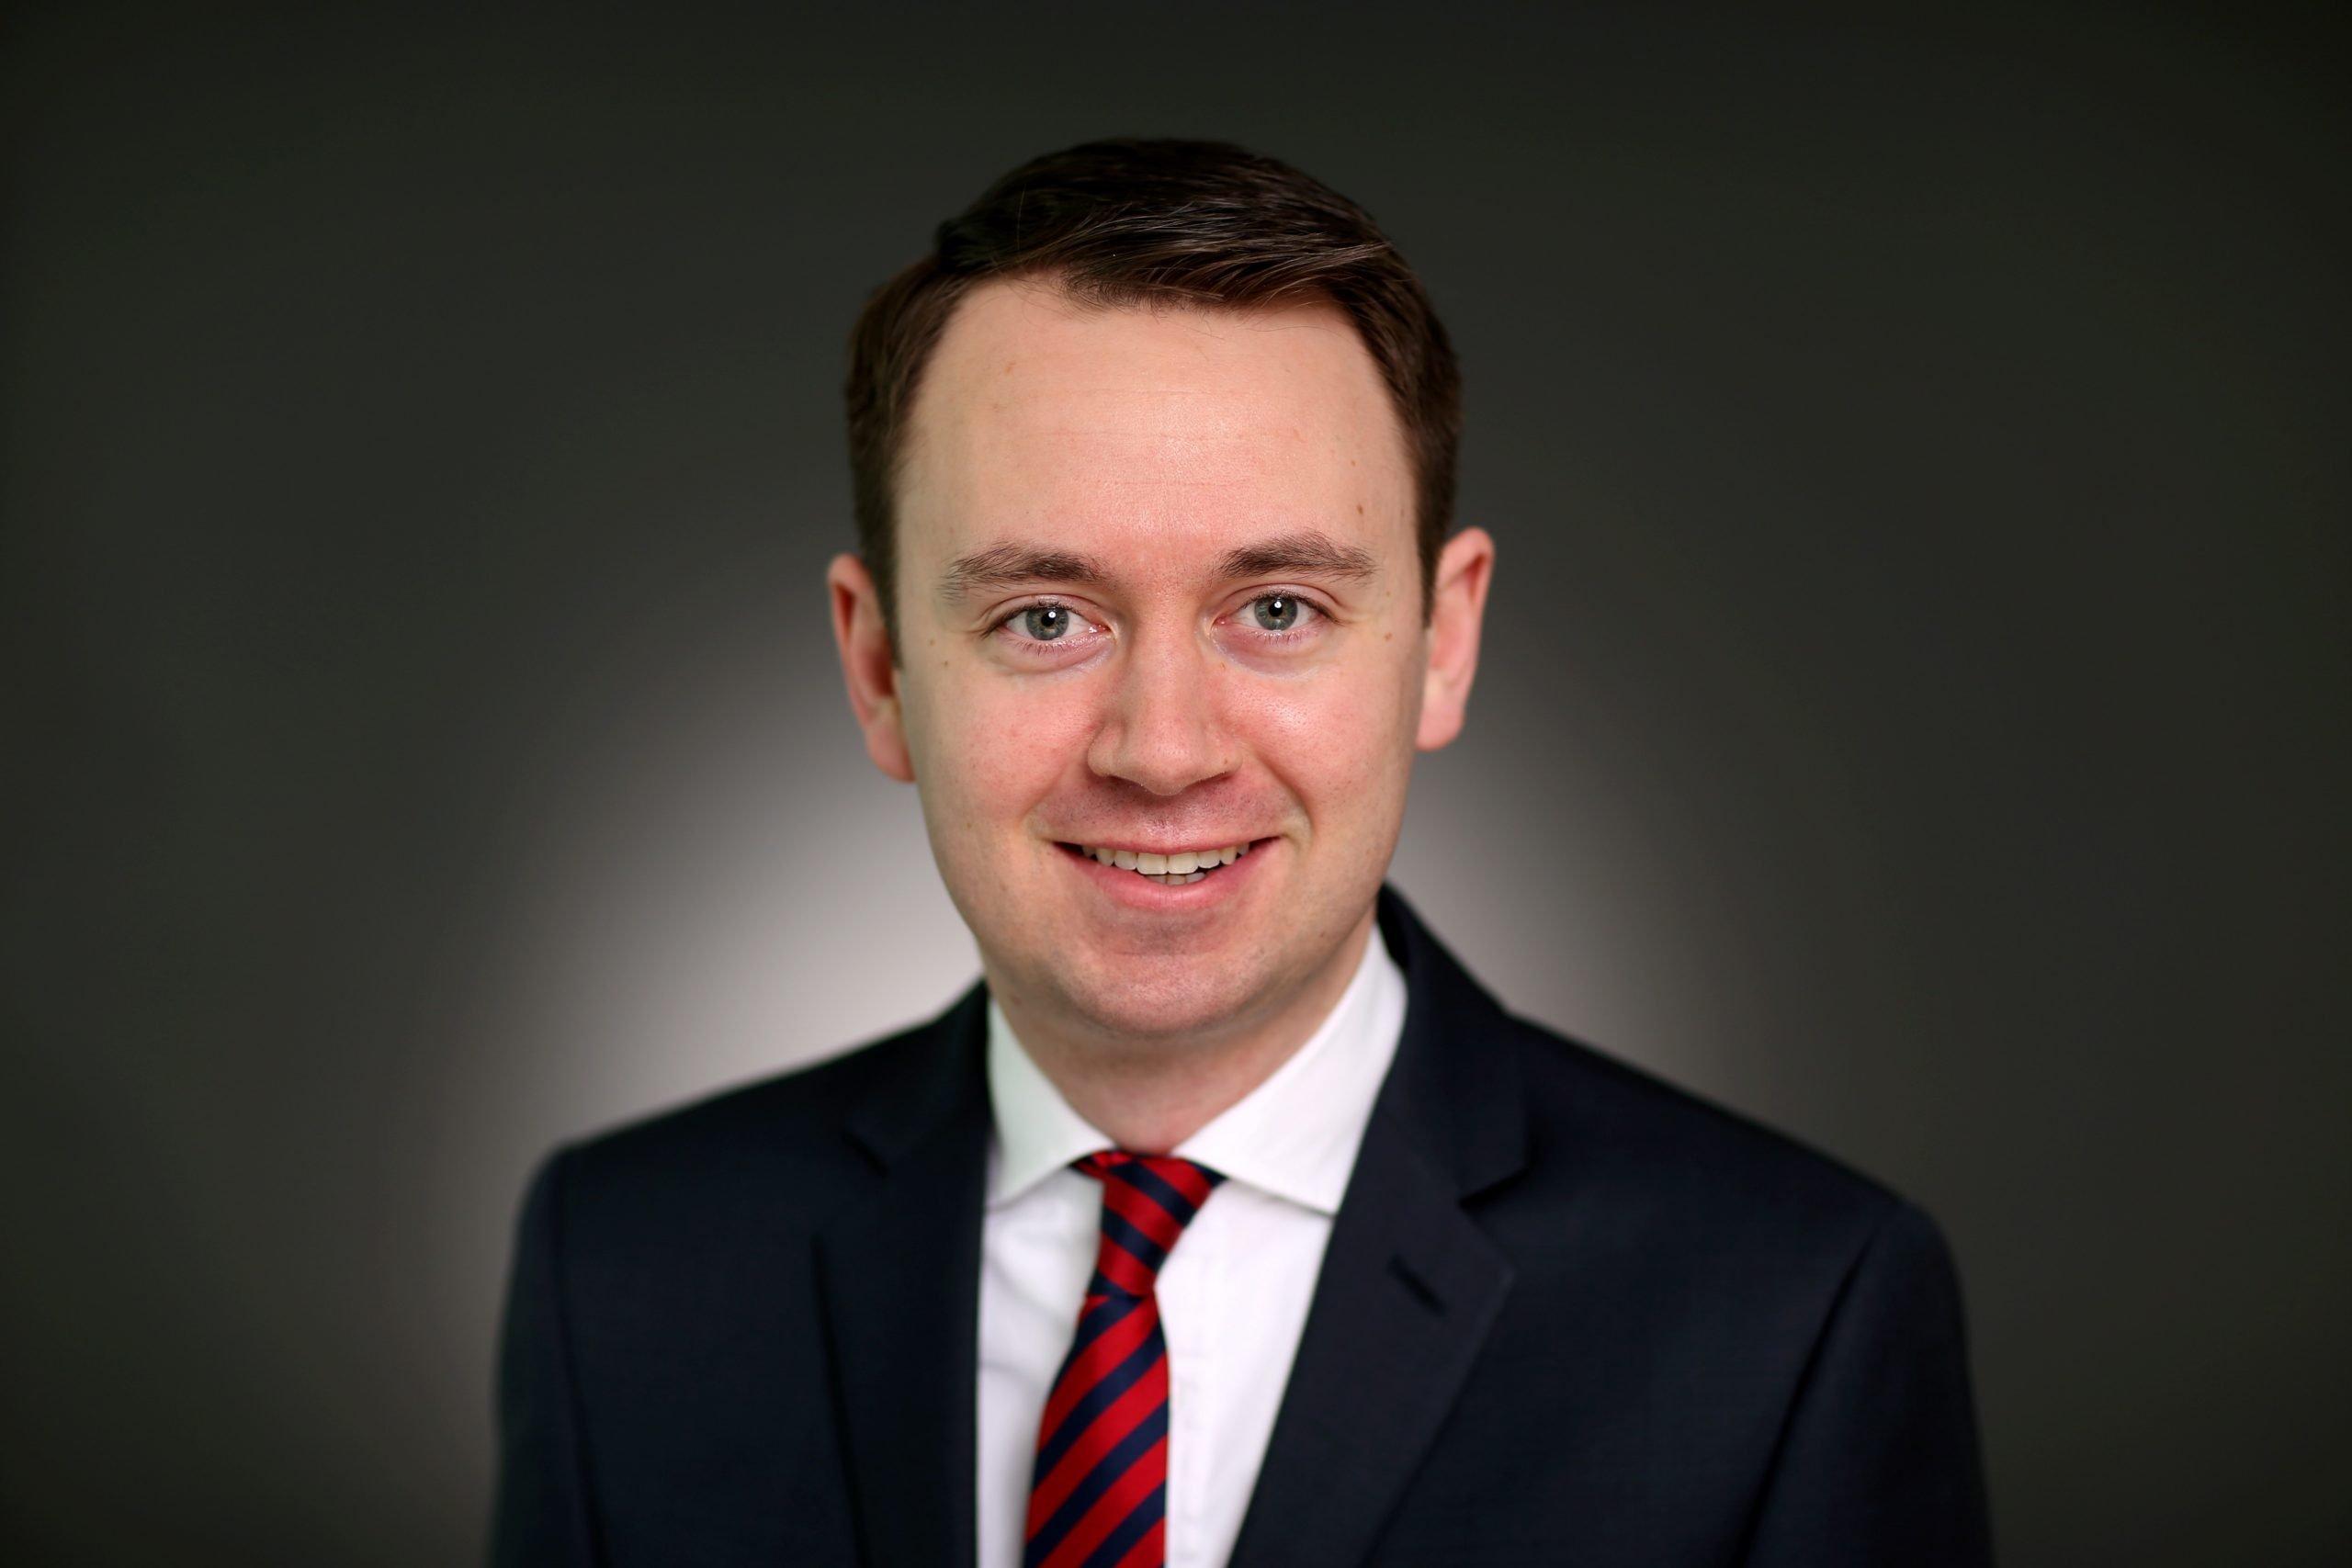 The speaker John O'Brien's profile image